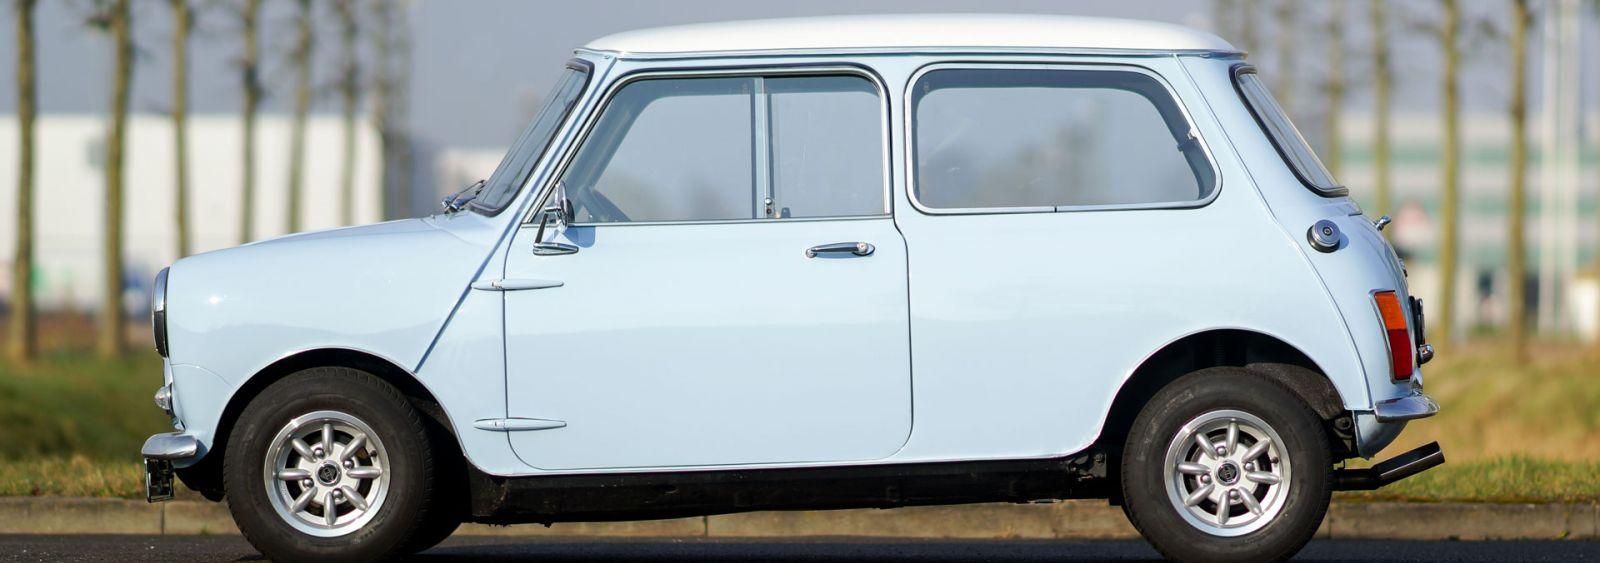 austin mini cooper mk 2 1968 classicargarage fr. Black Bedroom Furniture Sets. Home Design Ideas